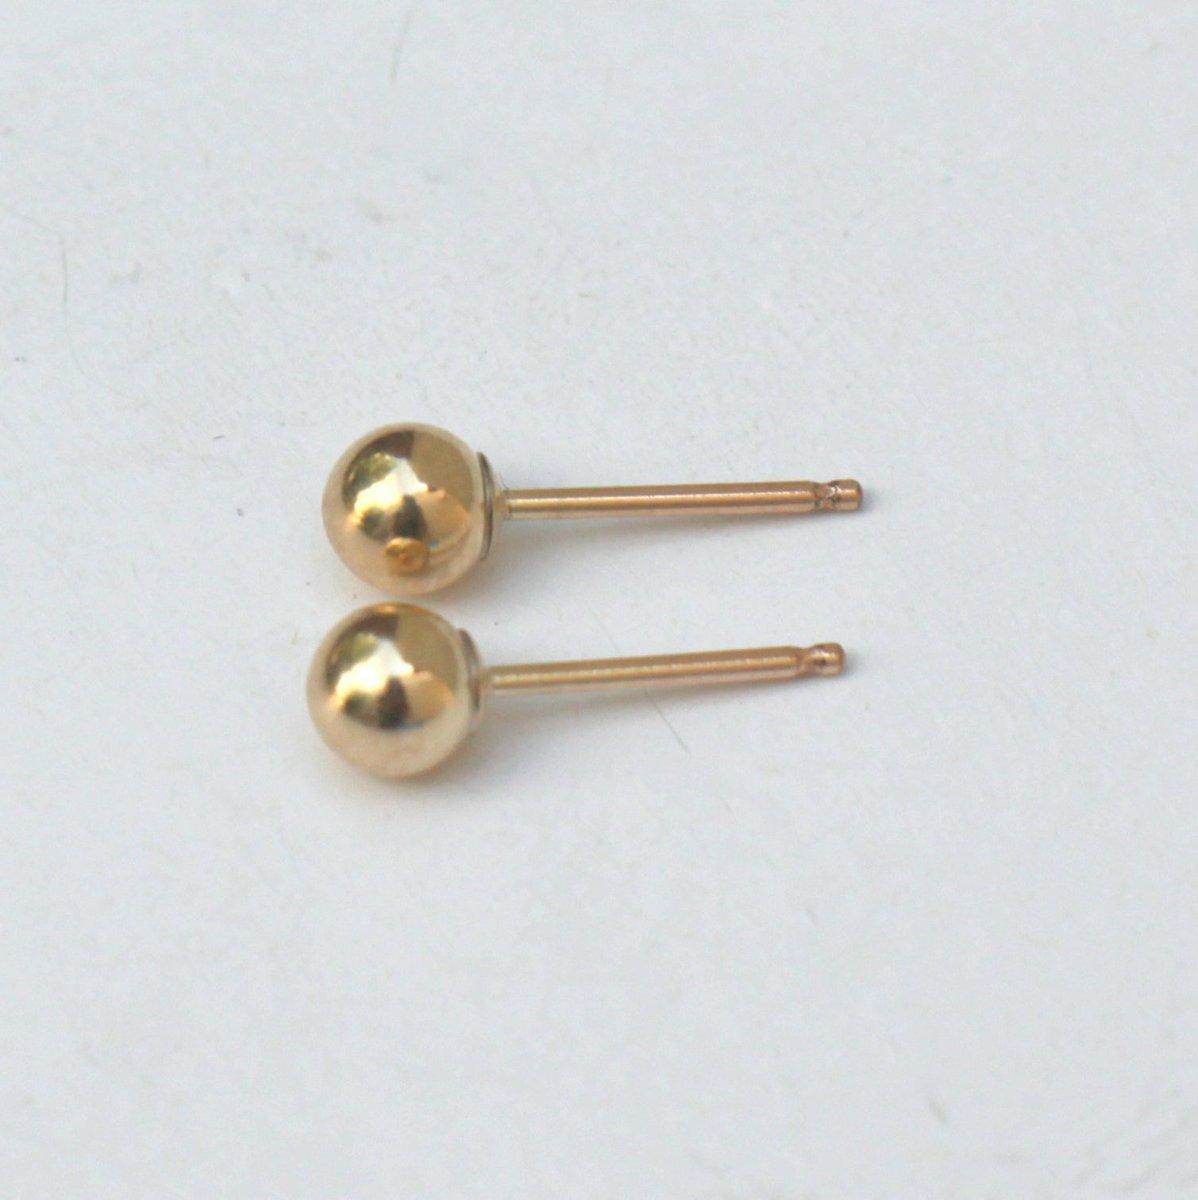 04c212e2f ... 14k Gold Filled Studs, Dot post Earrings, Tiny Studs, 4mm Dot Studs,  Simple small ball Earrings #jewelry #earrings #gold #girls #circle # minimalist ...